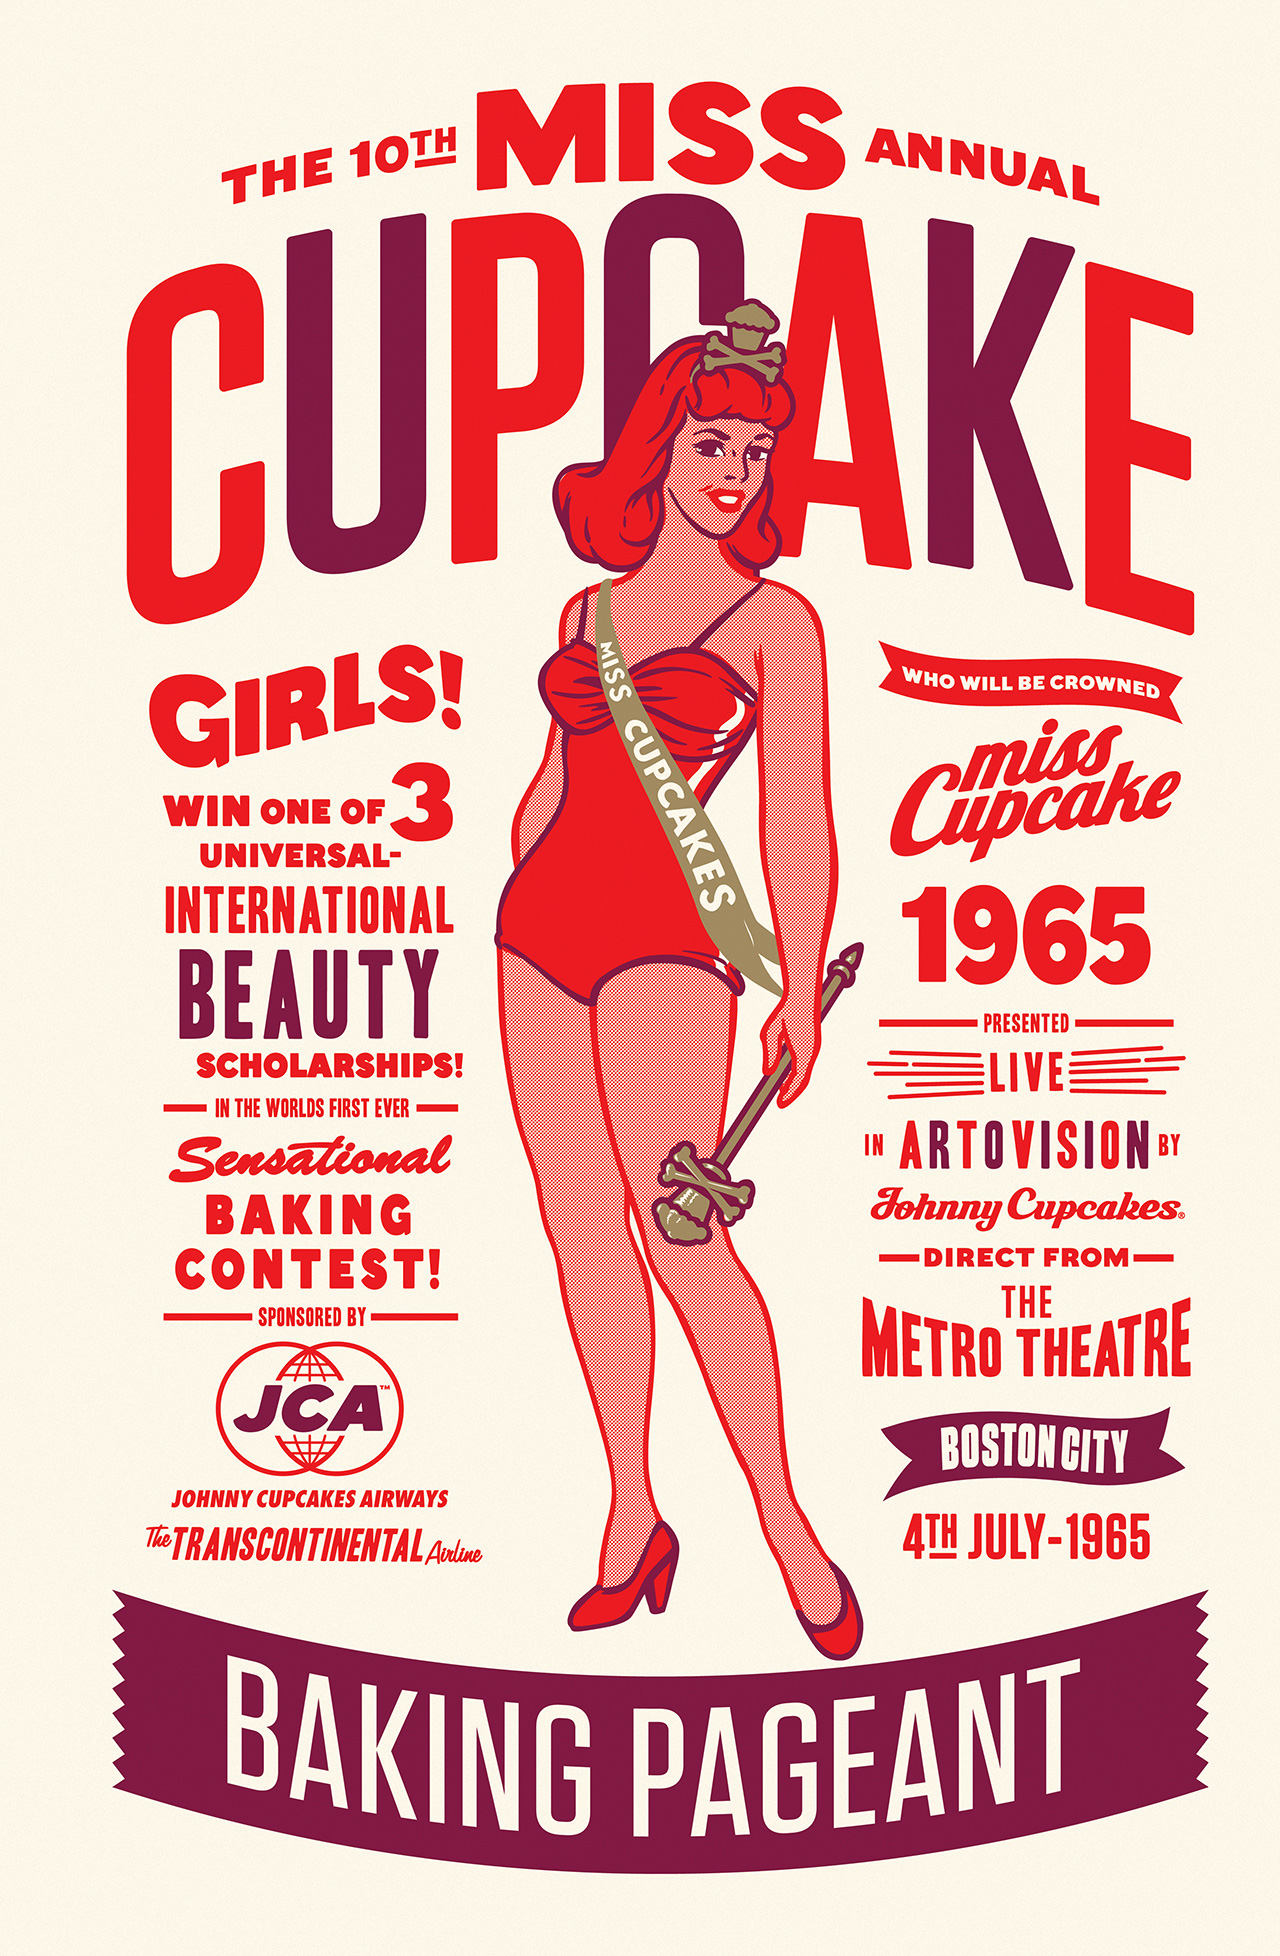 TS_JOHNNYCUPCAKES_Miss_Cupcake_72dpi.jpg